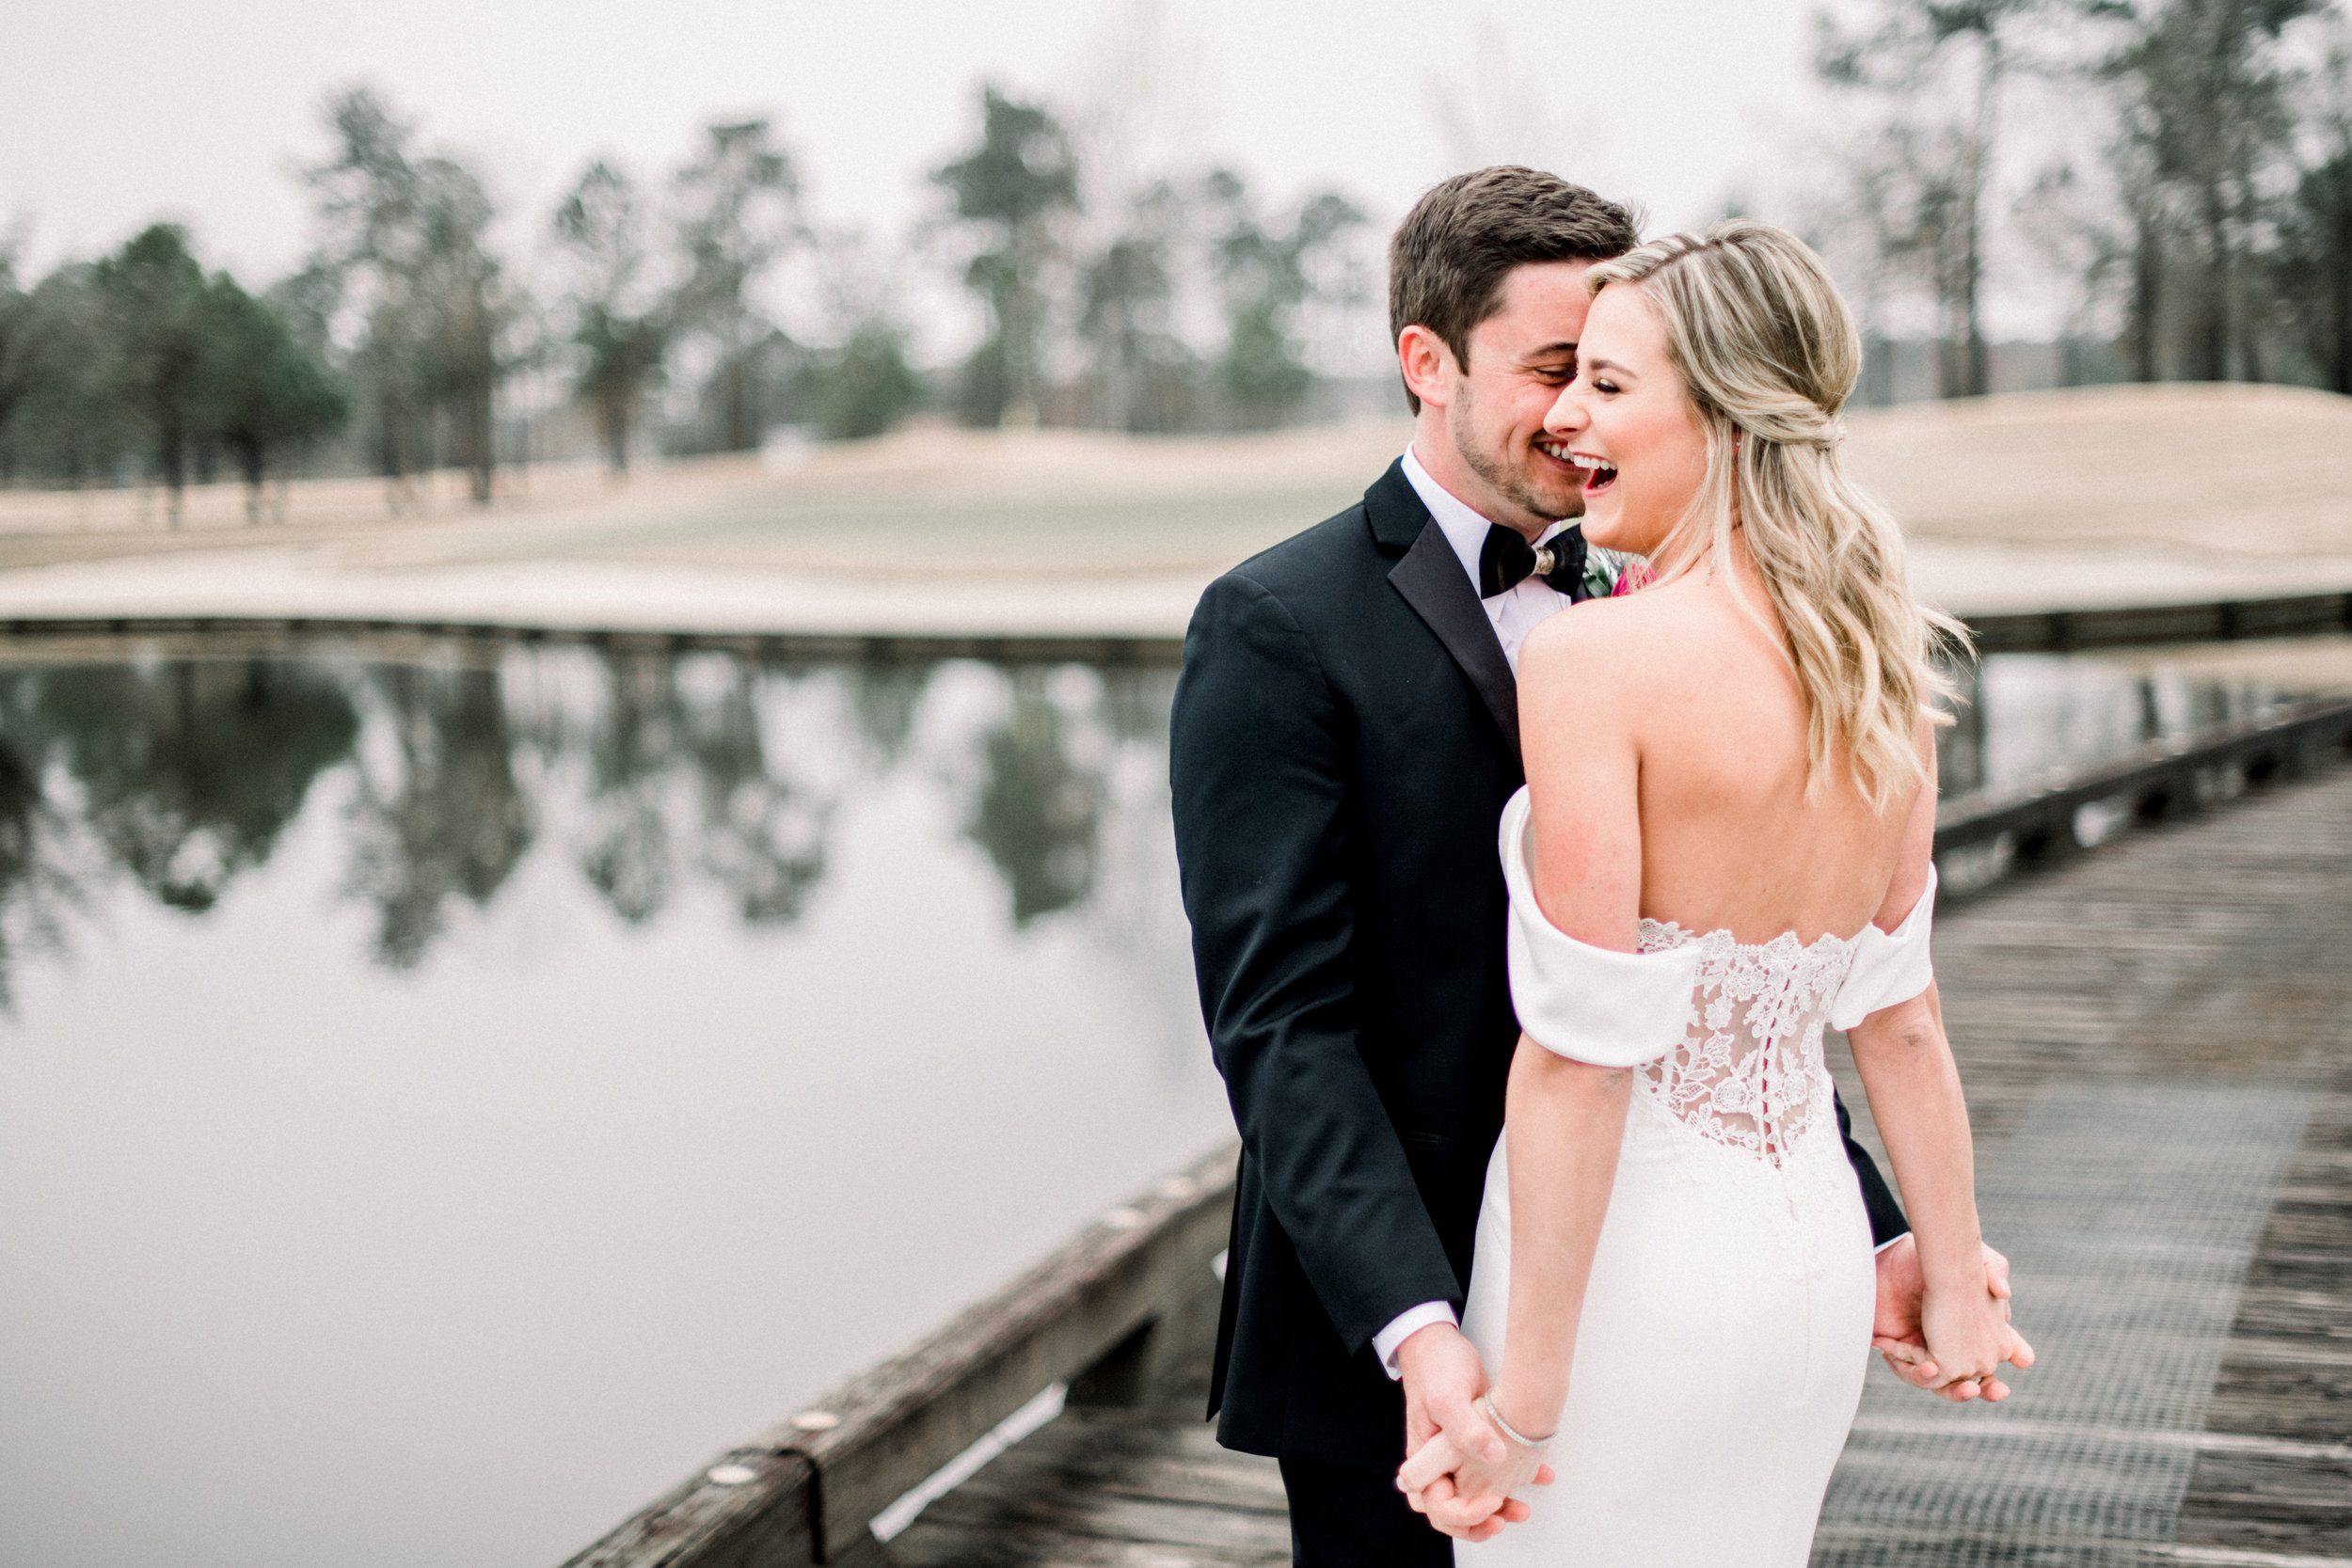 river-landing-wedding-venue-affordable-nc.jpg